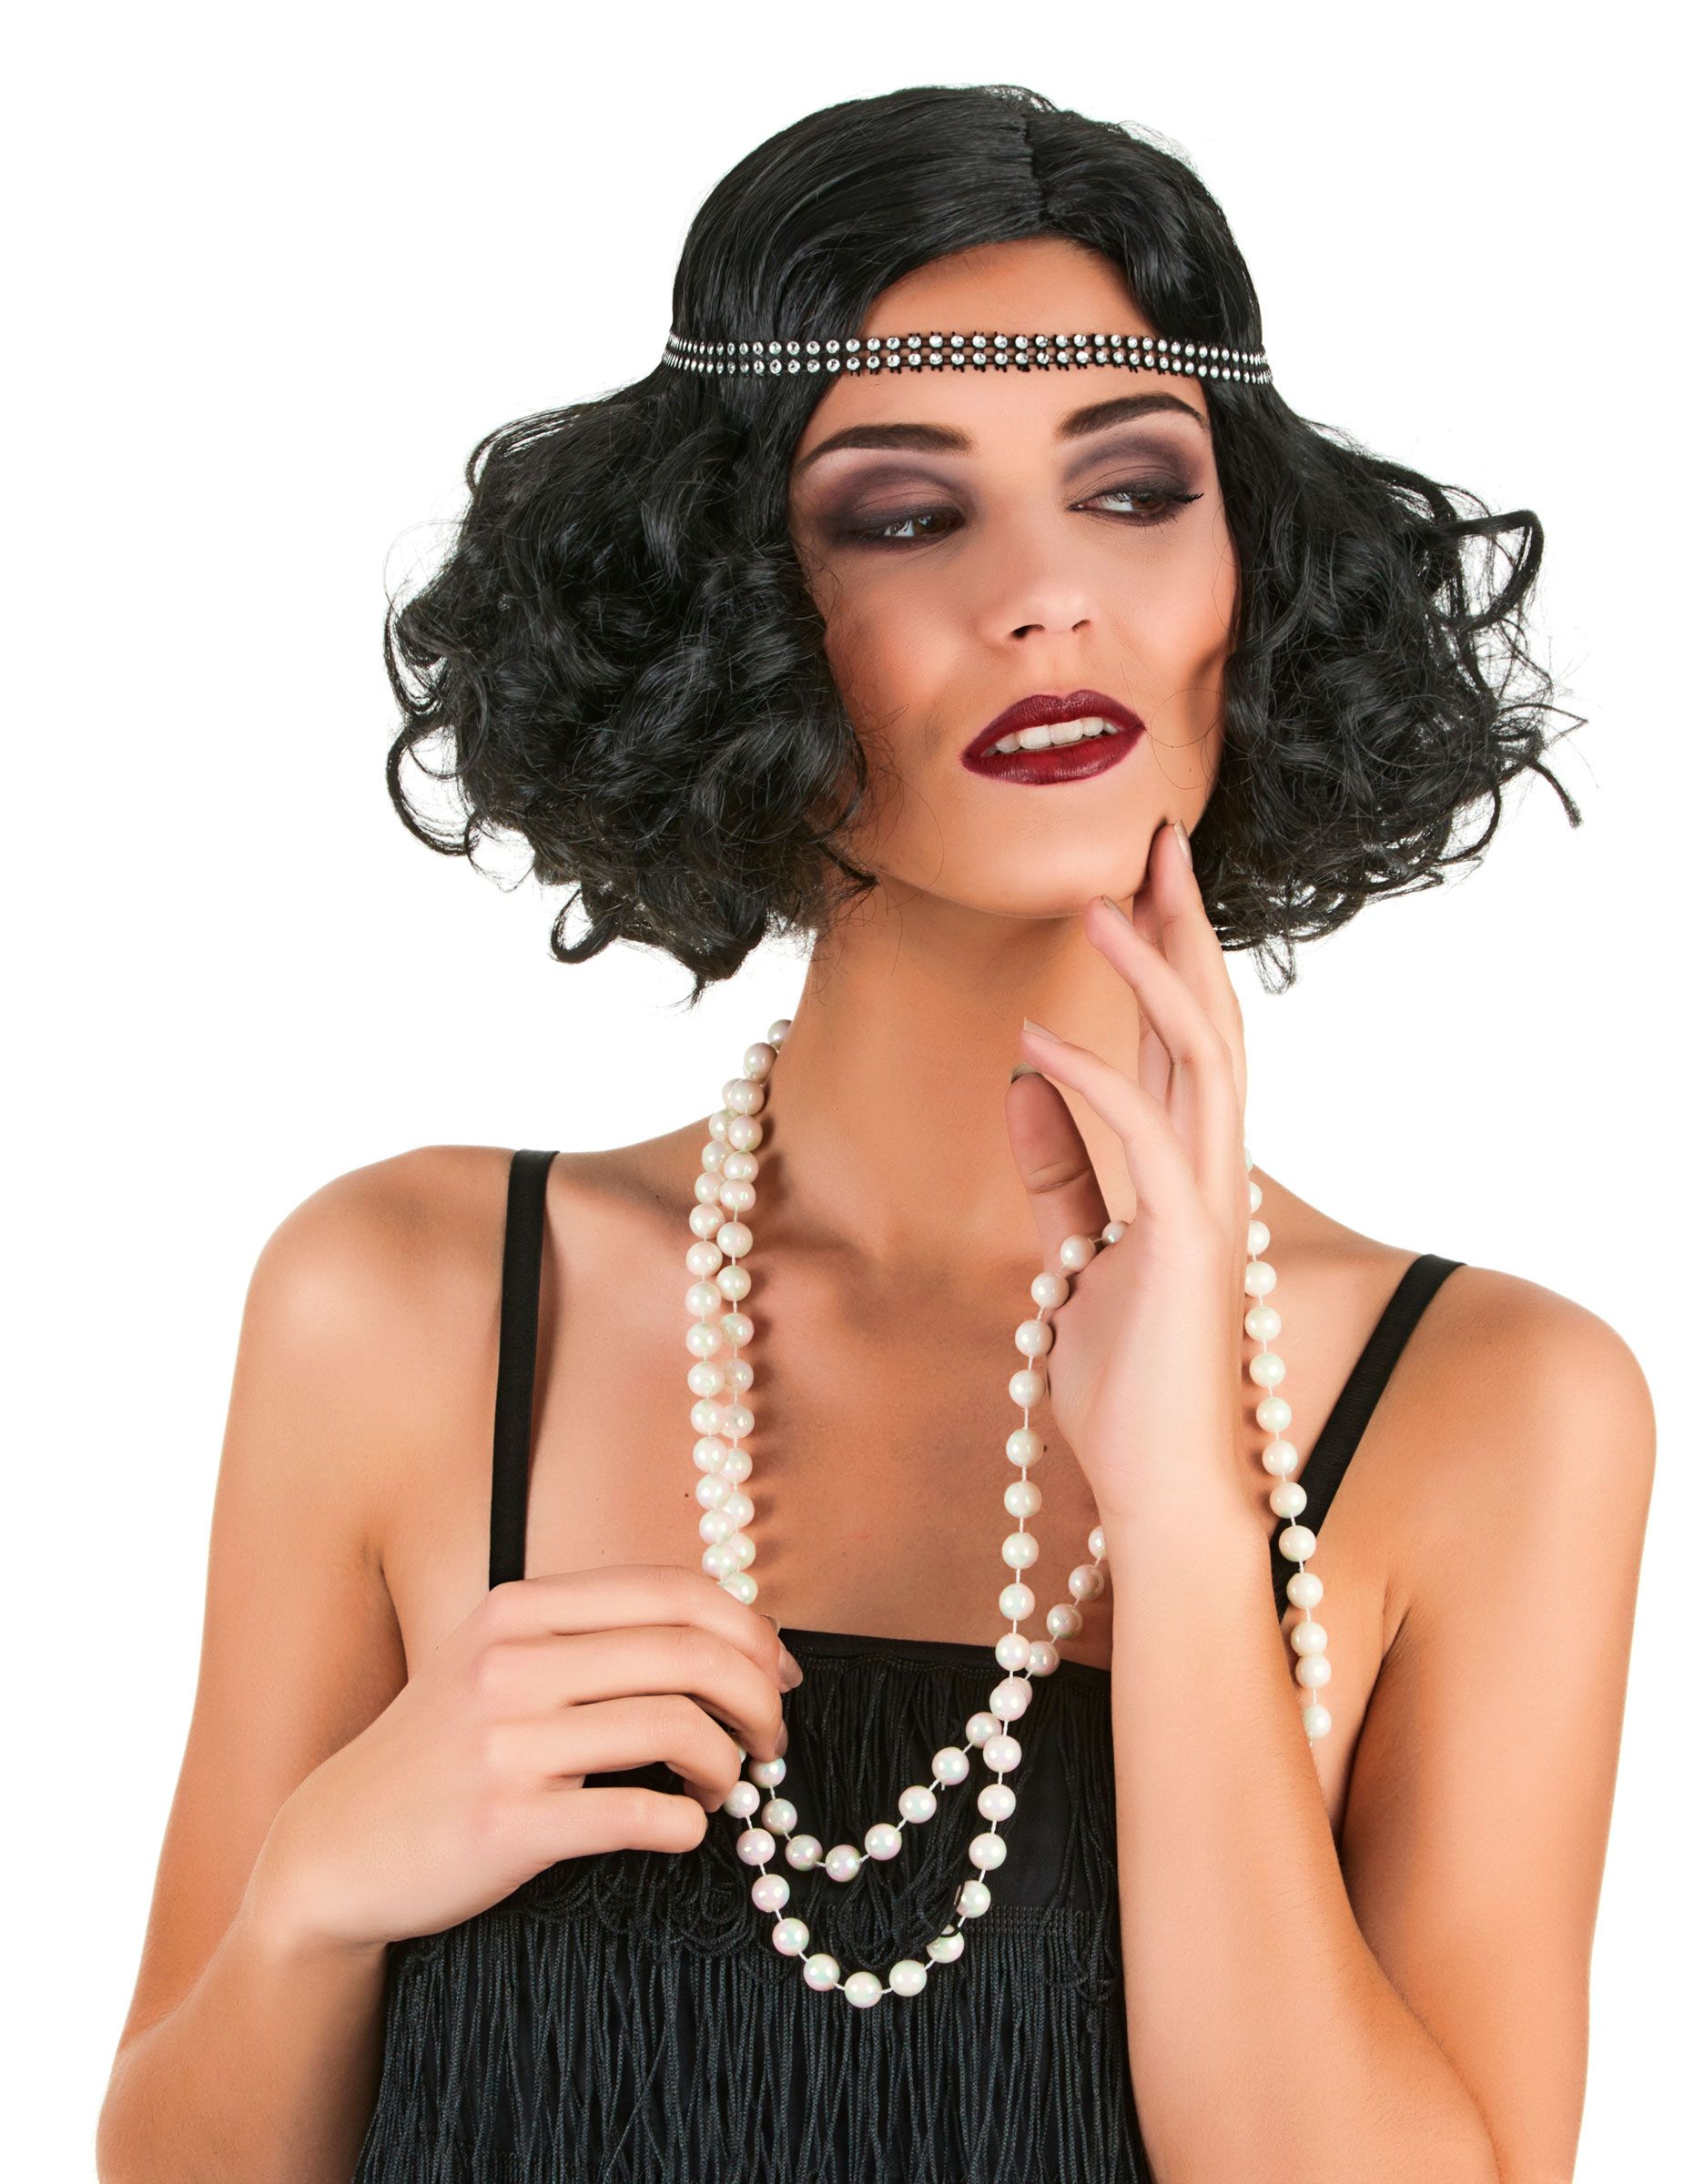 Perruque charleston noire femme | poses |